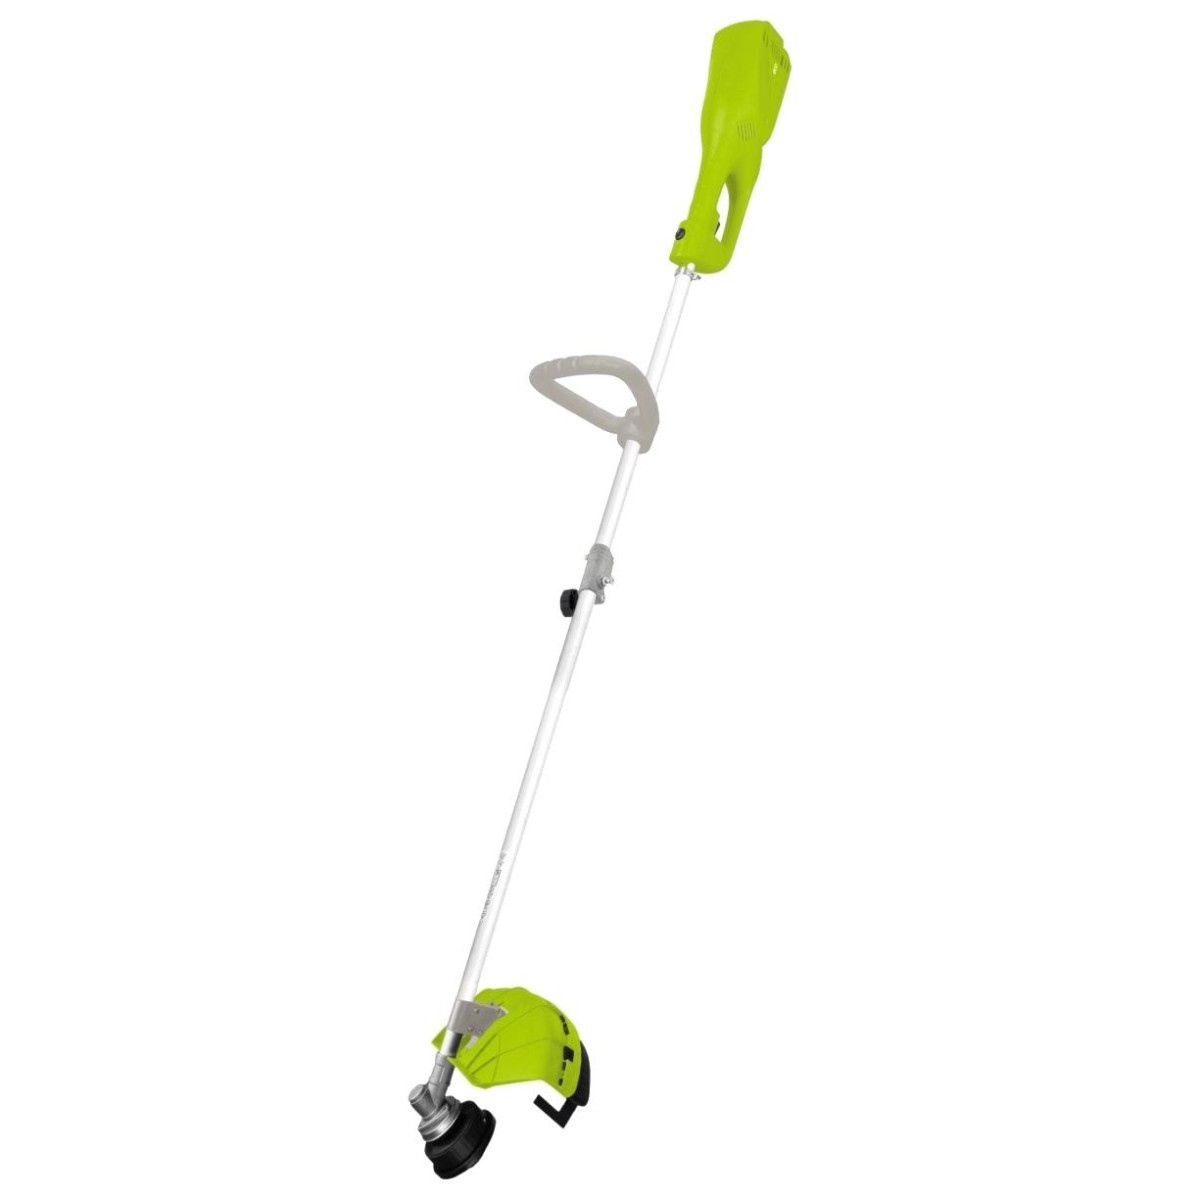 Триммер электрический Green Revolution GR-15-38E 1500Вт